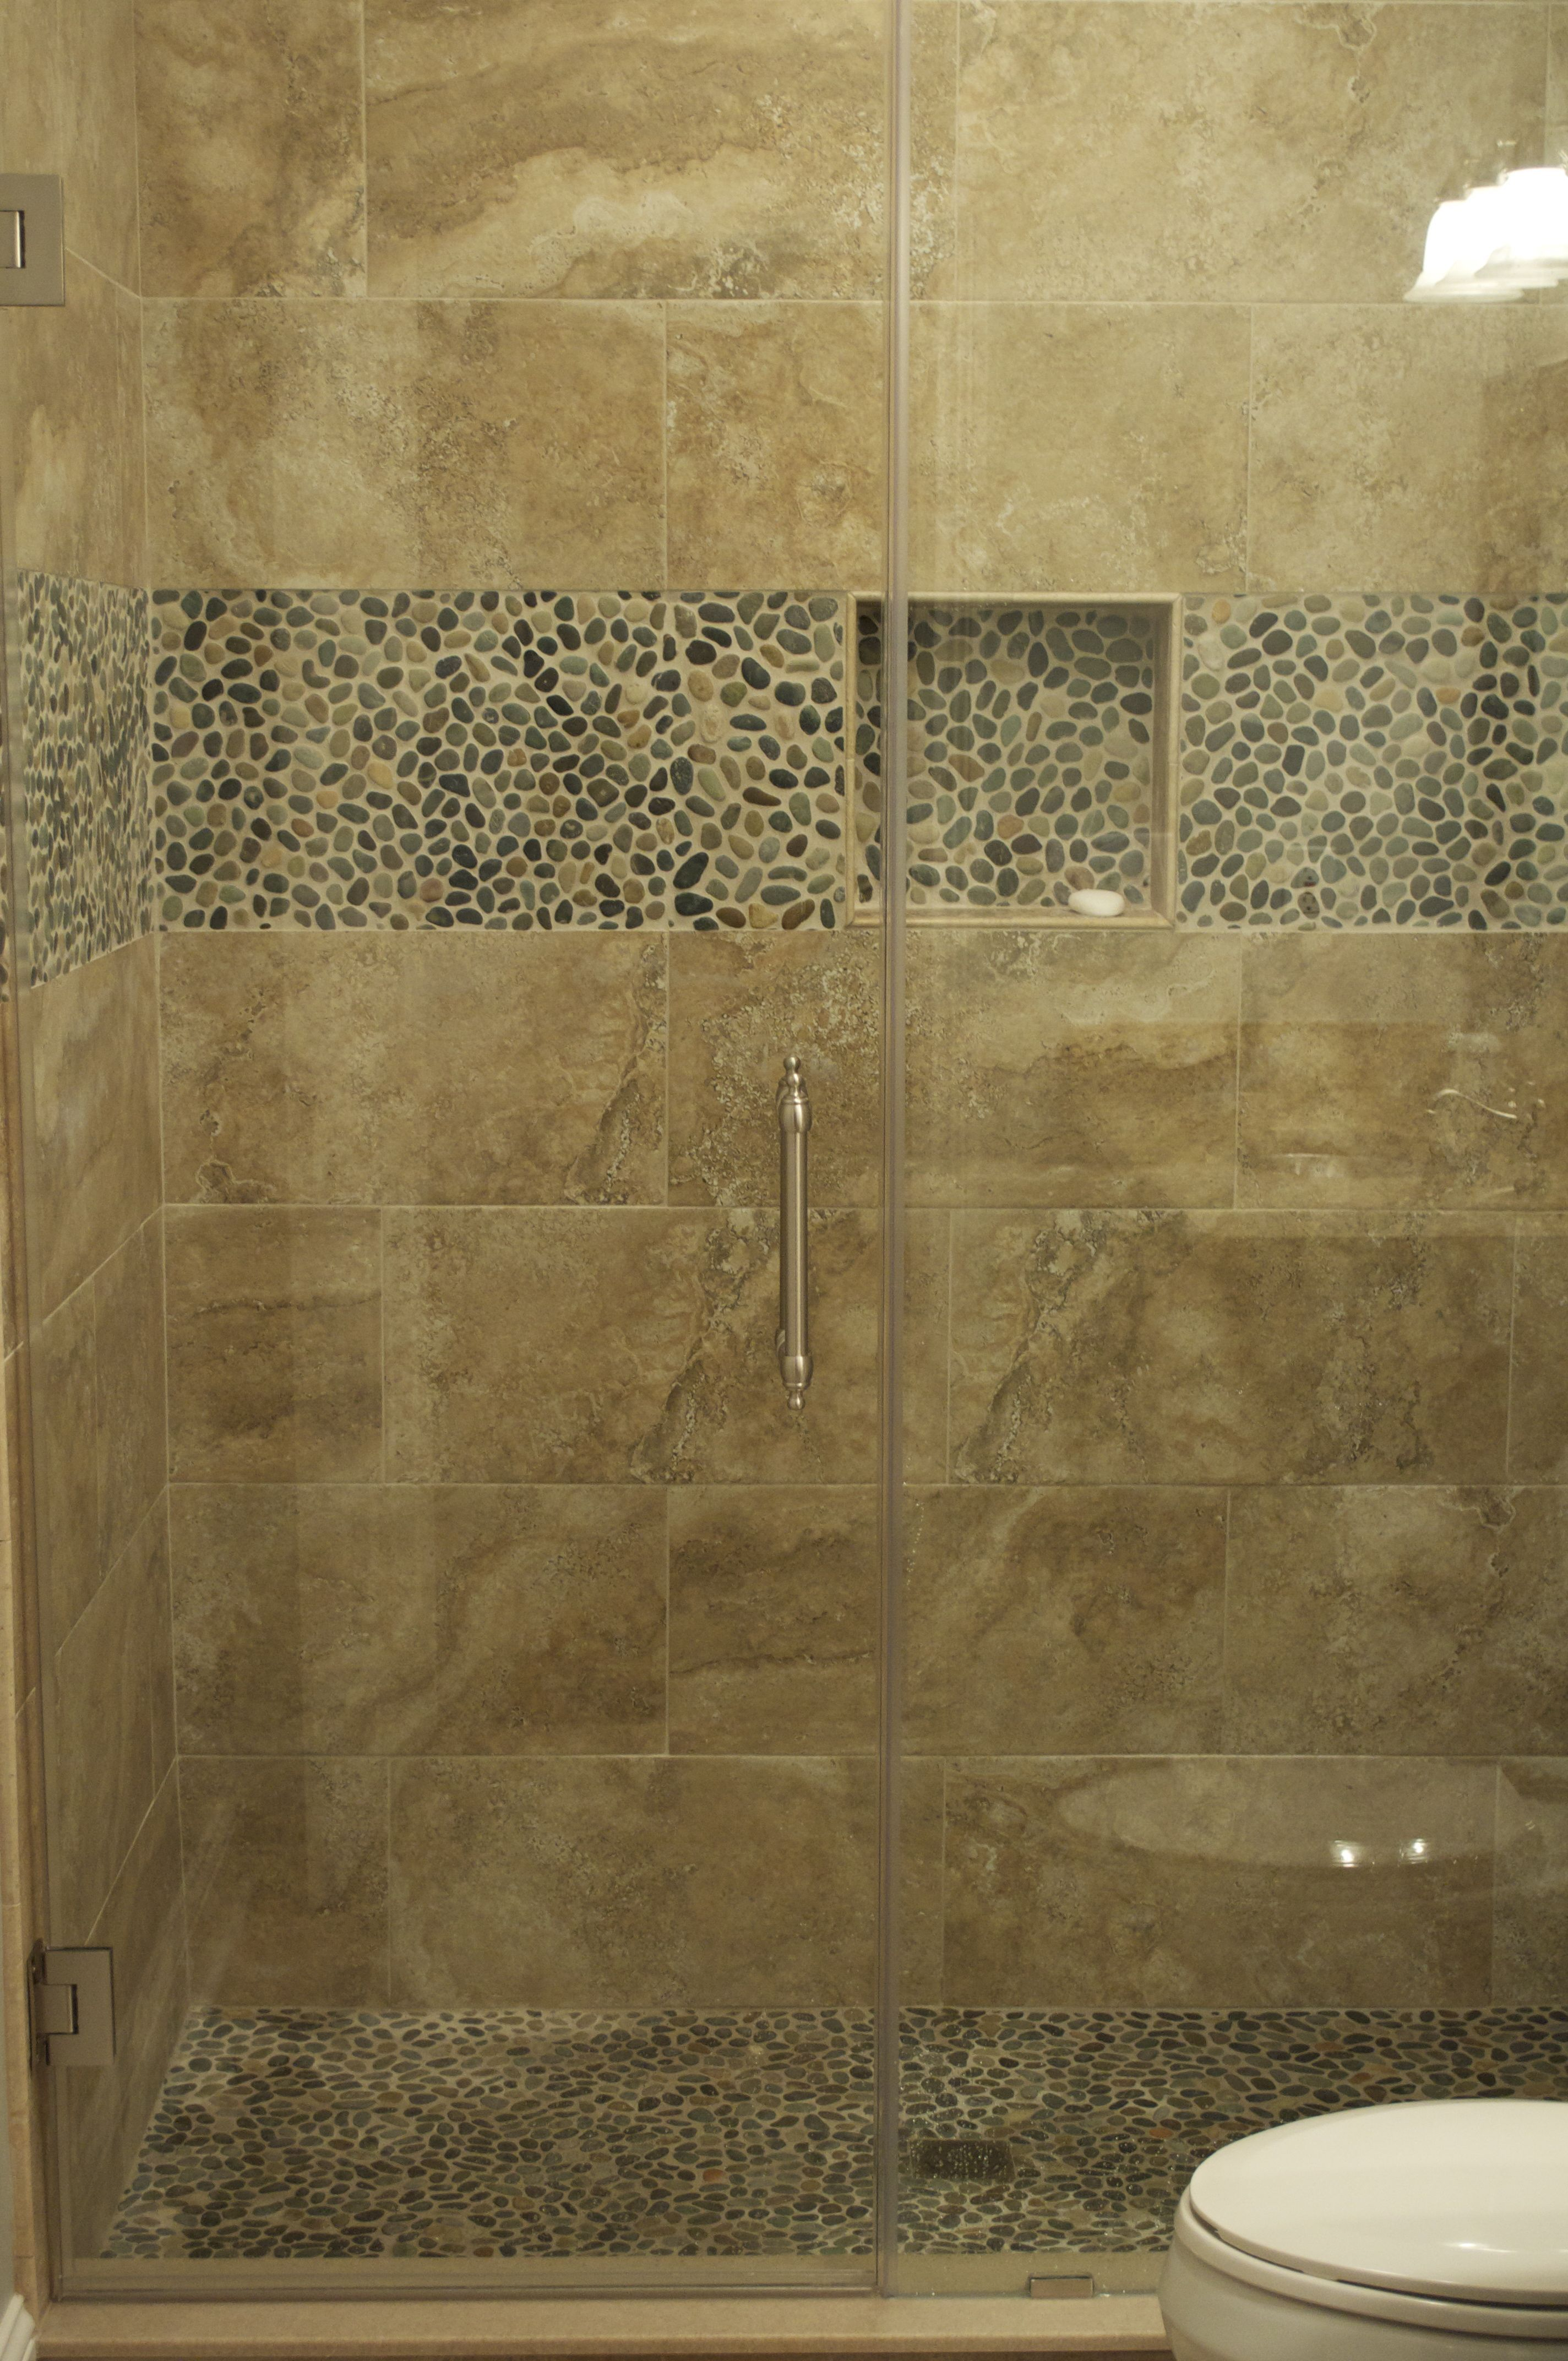 CMH Builders Custom tiled shower with pebble floor, border, and shampoos niche